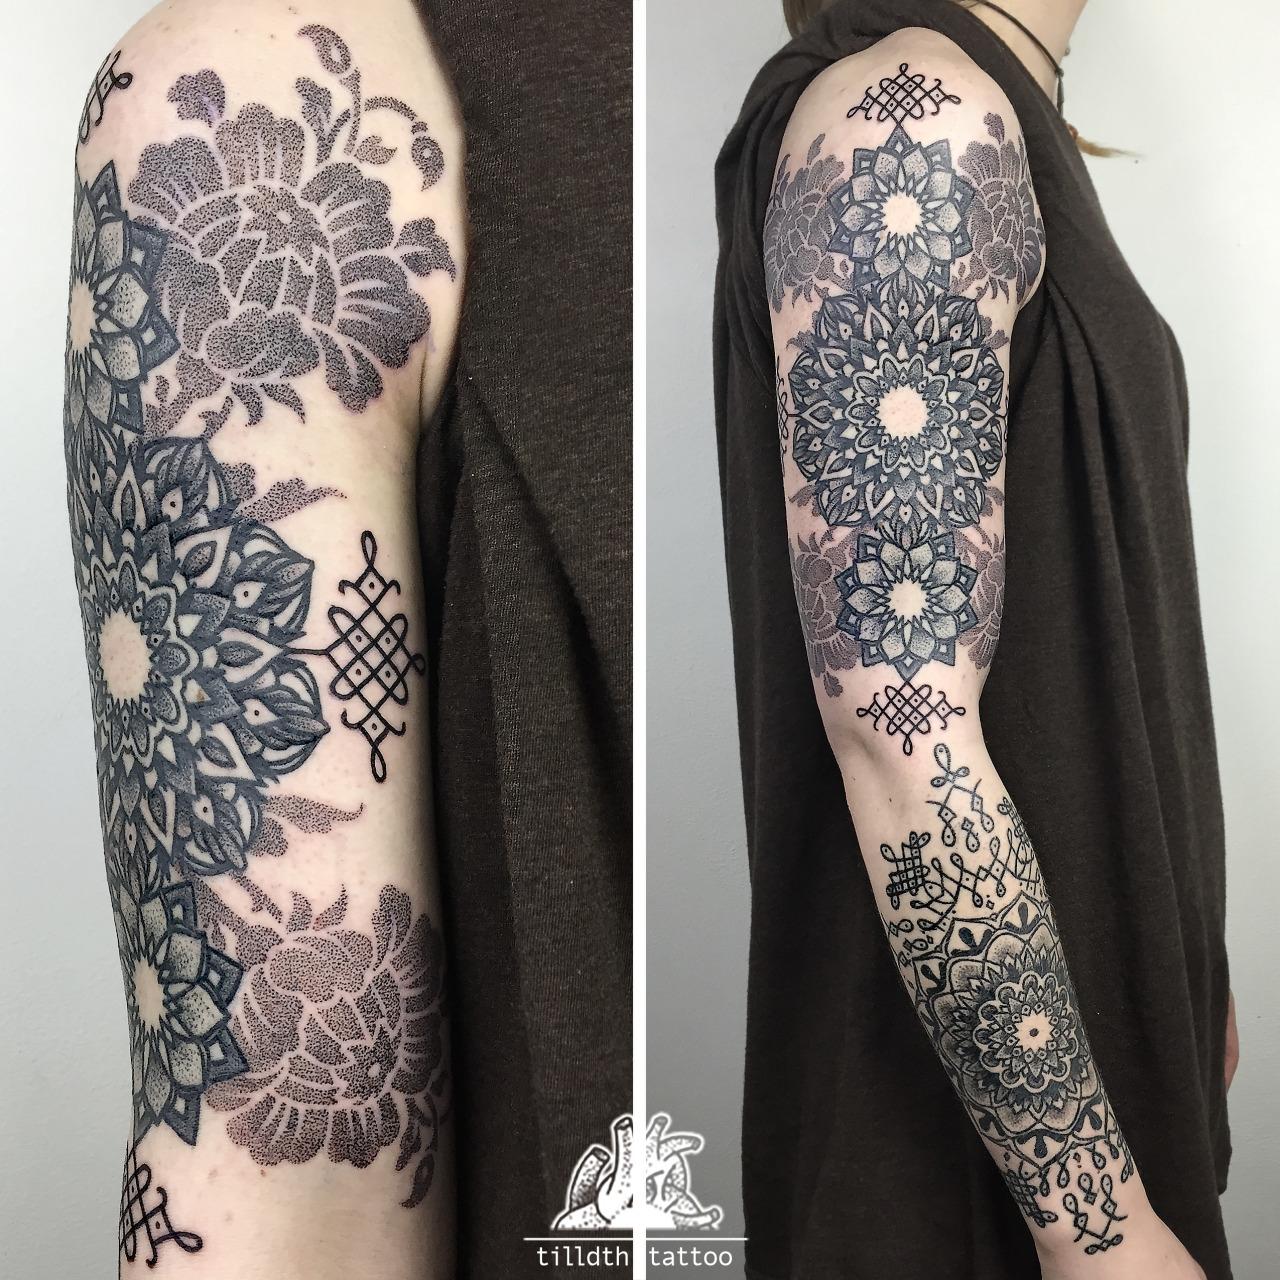 Tilldth Tattoo - the vandallist (18)